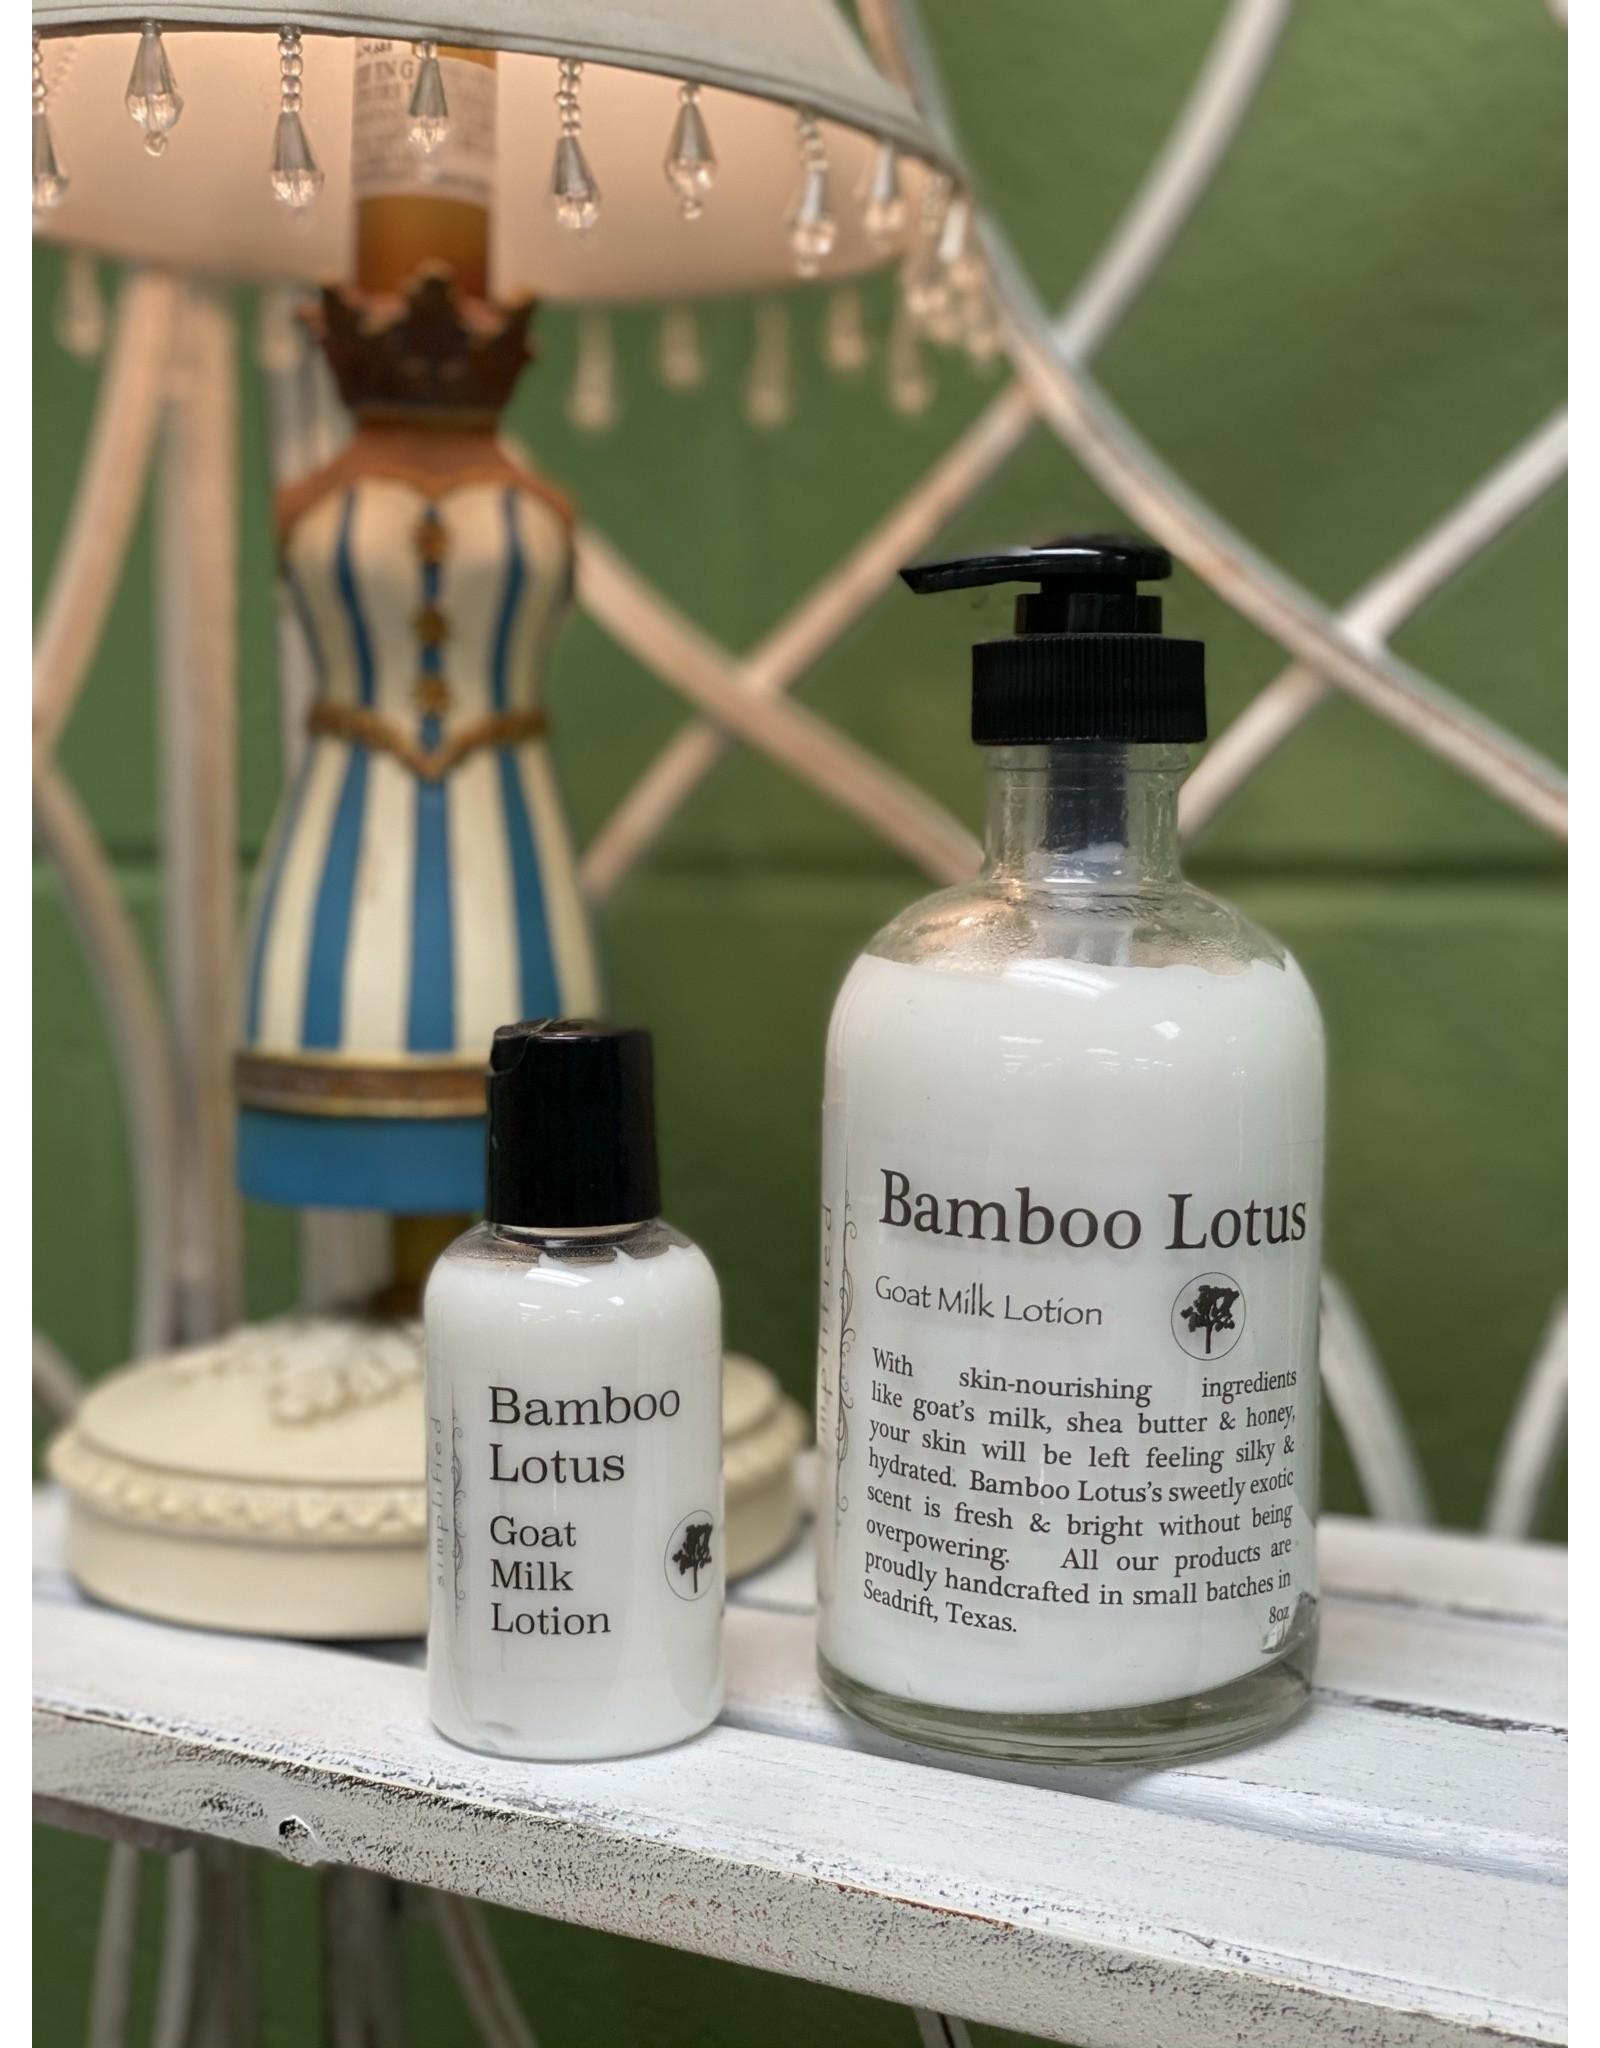 Bamboo Lotus Goat Milk Lotion 8oz